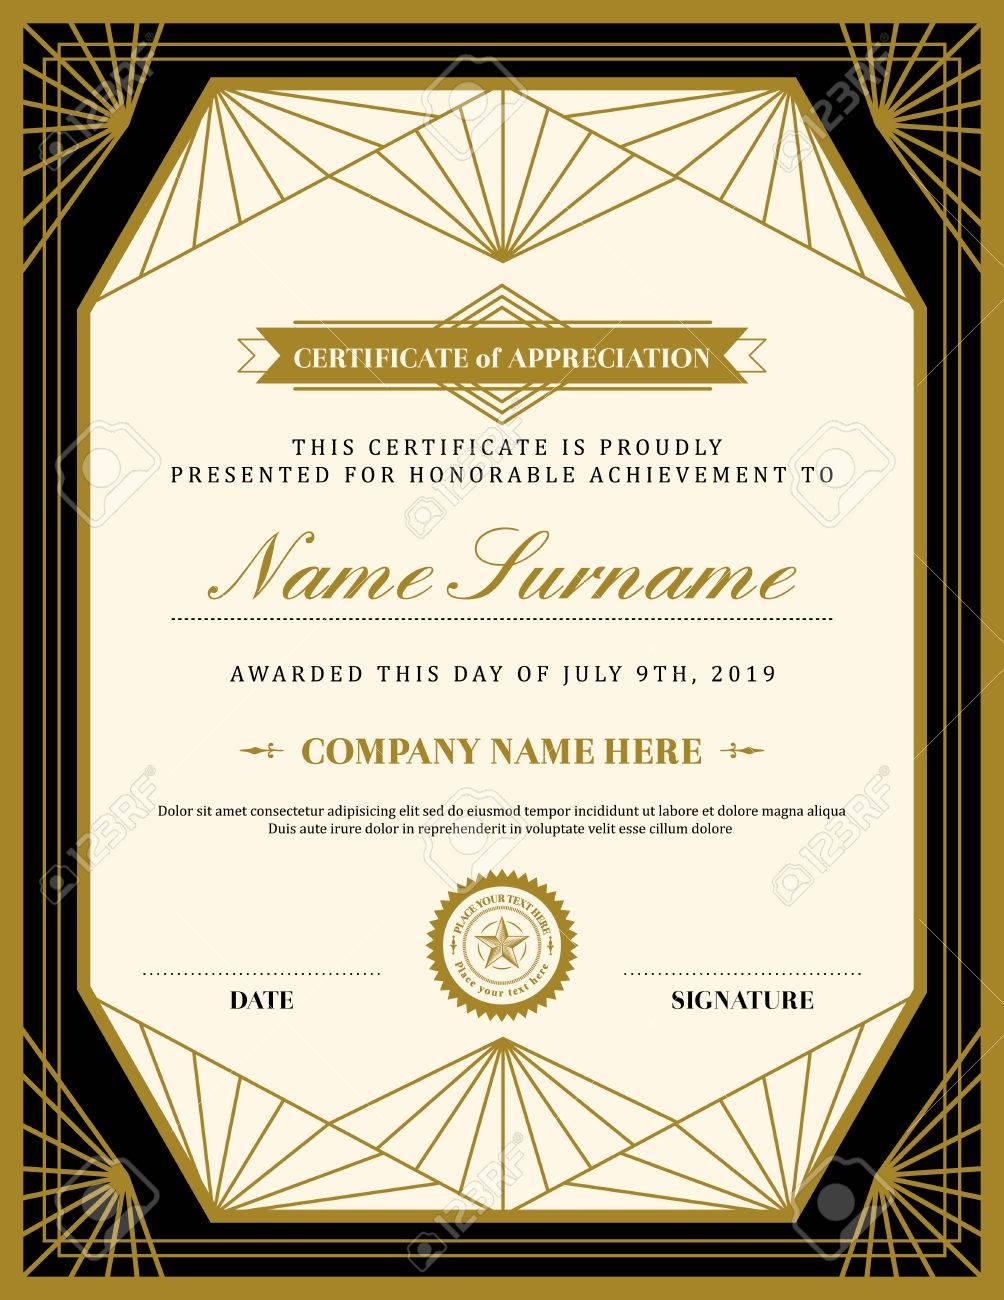 Vintage retro art deco frame certificate background design template - 50155145